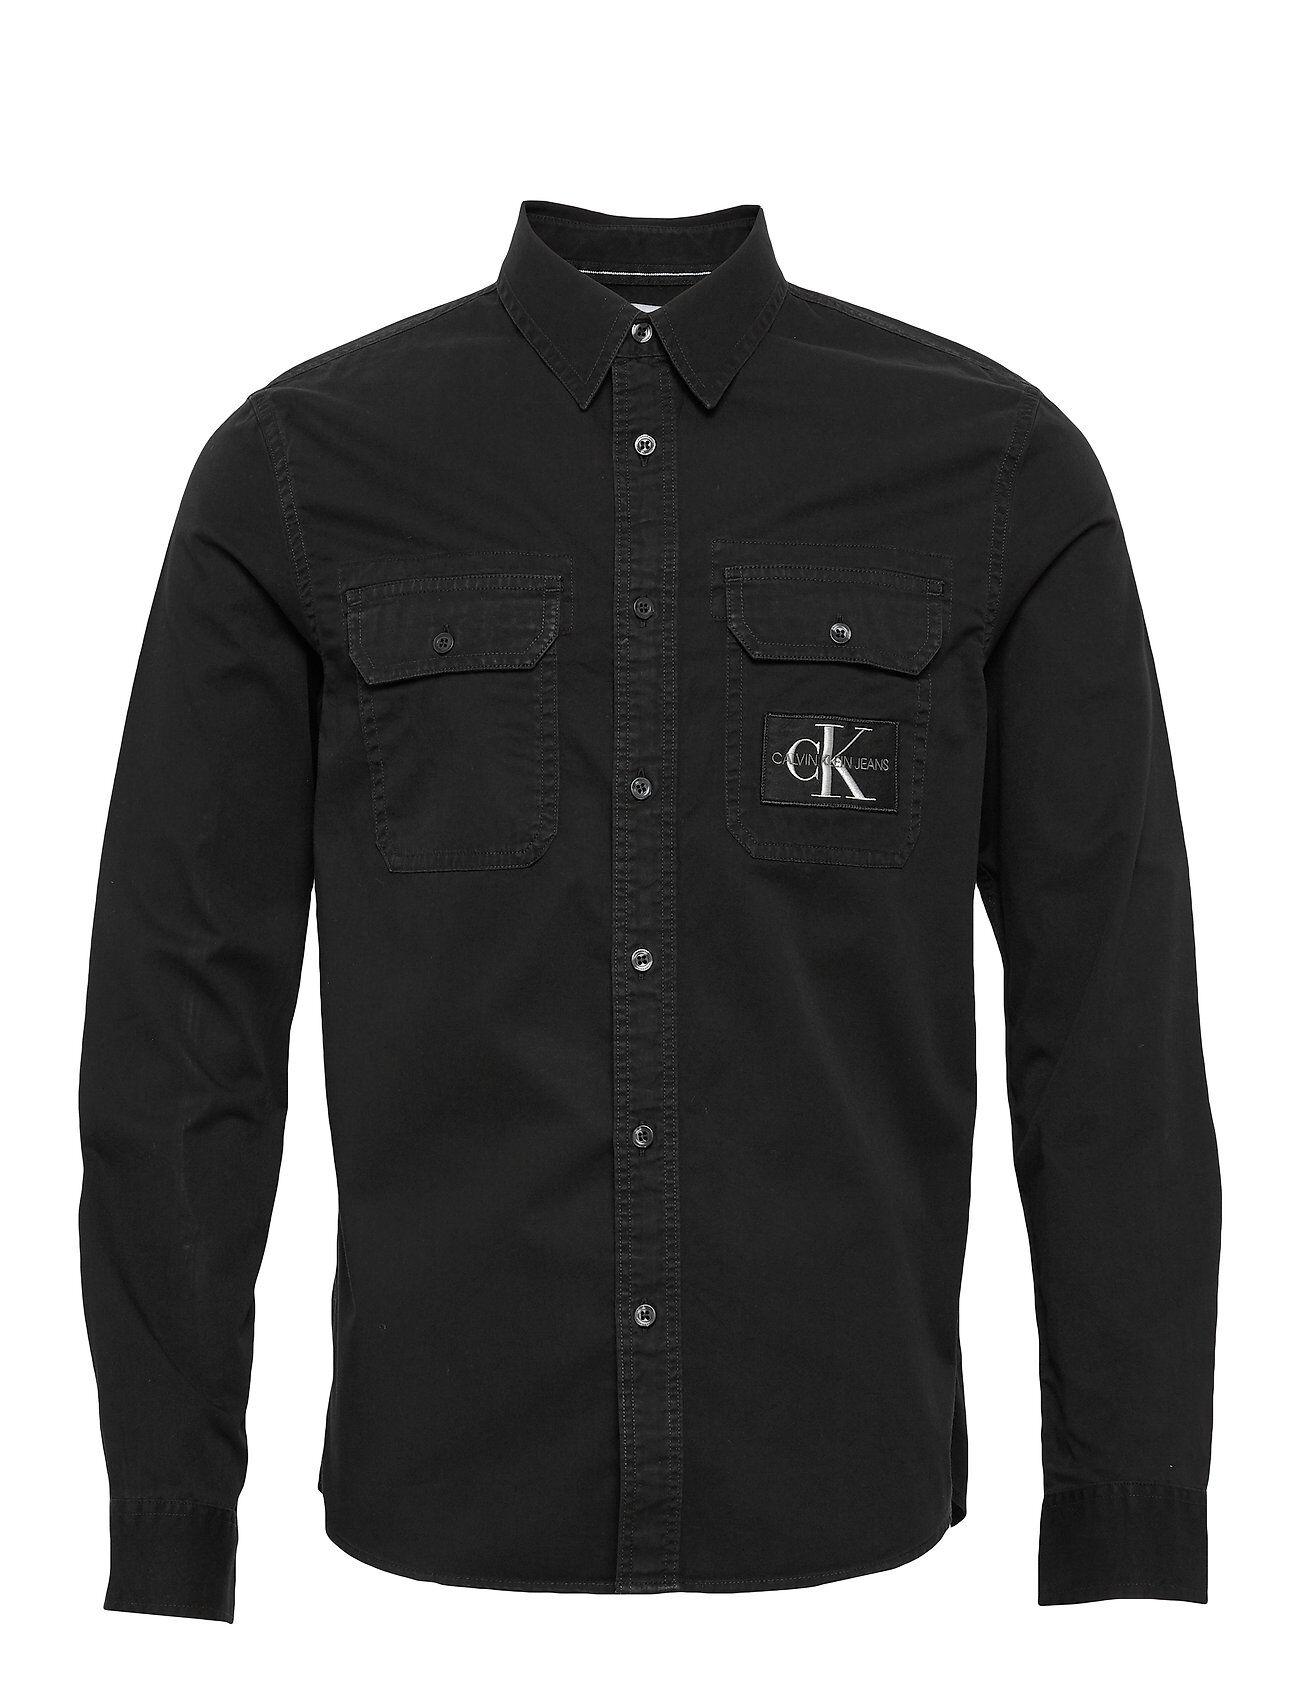 Image of Calvin Gmd Utility Reg Shirt Paita Rento Casual Musta Calvin Klein Jeans